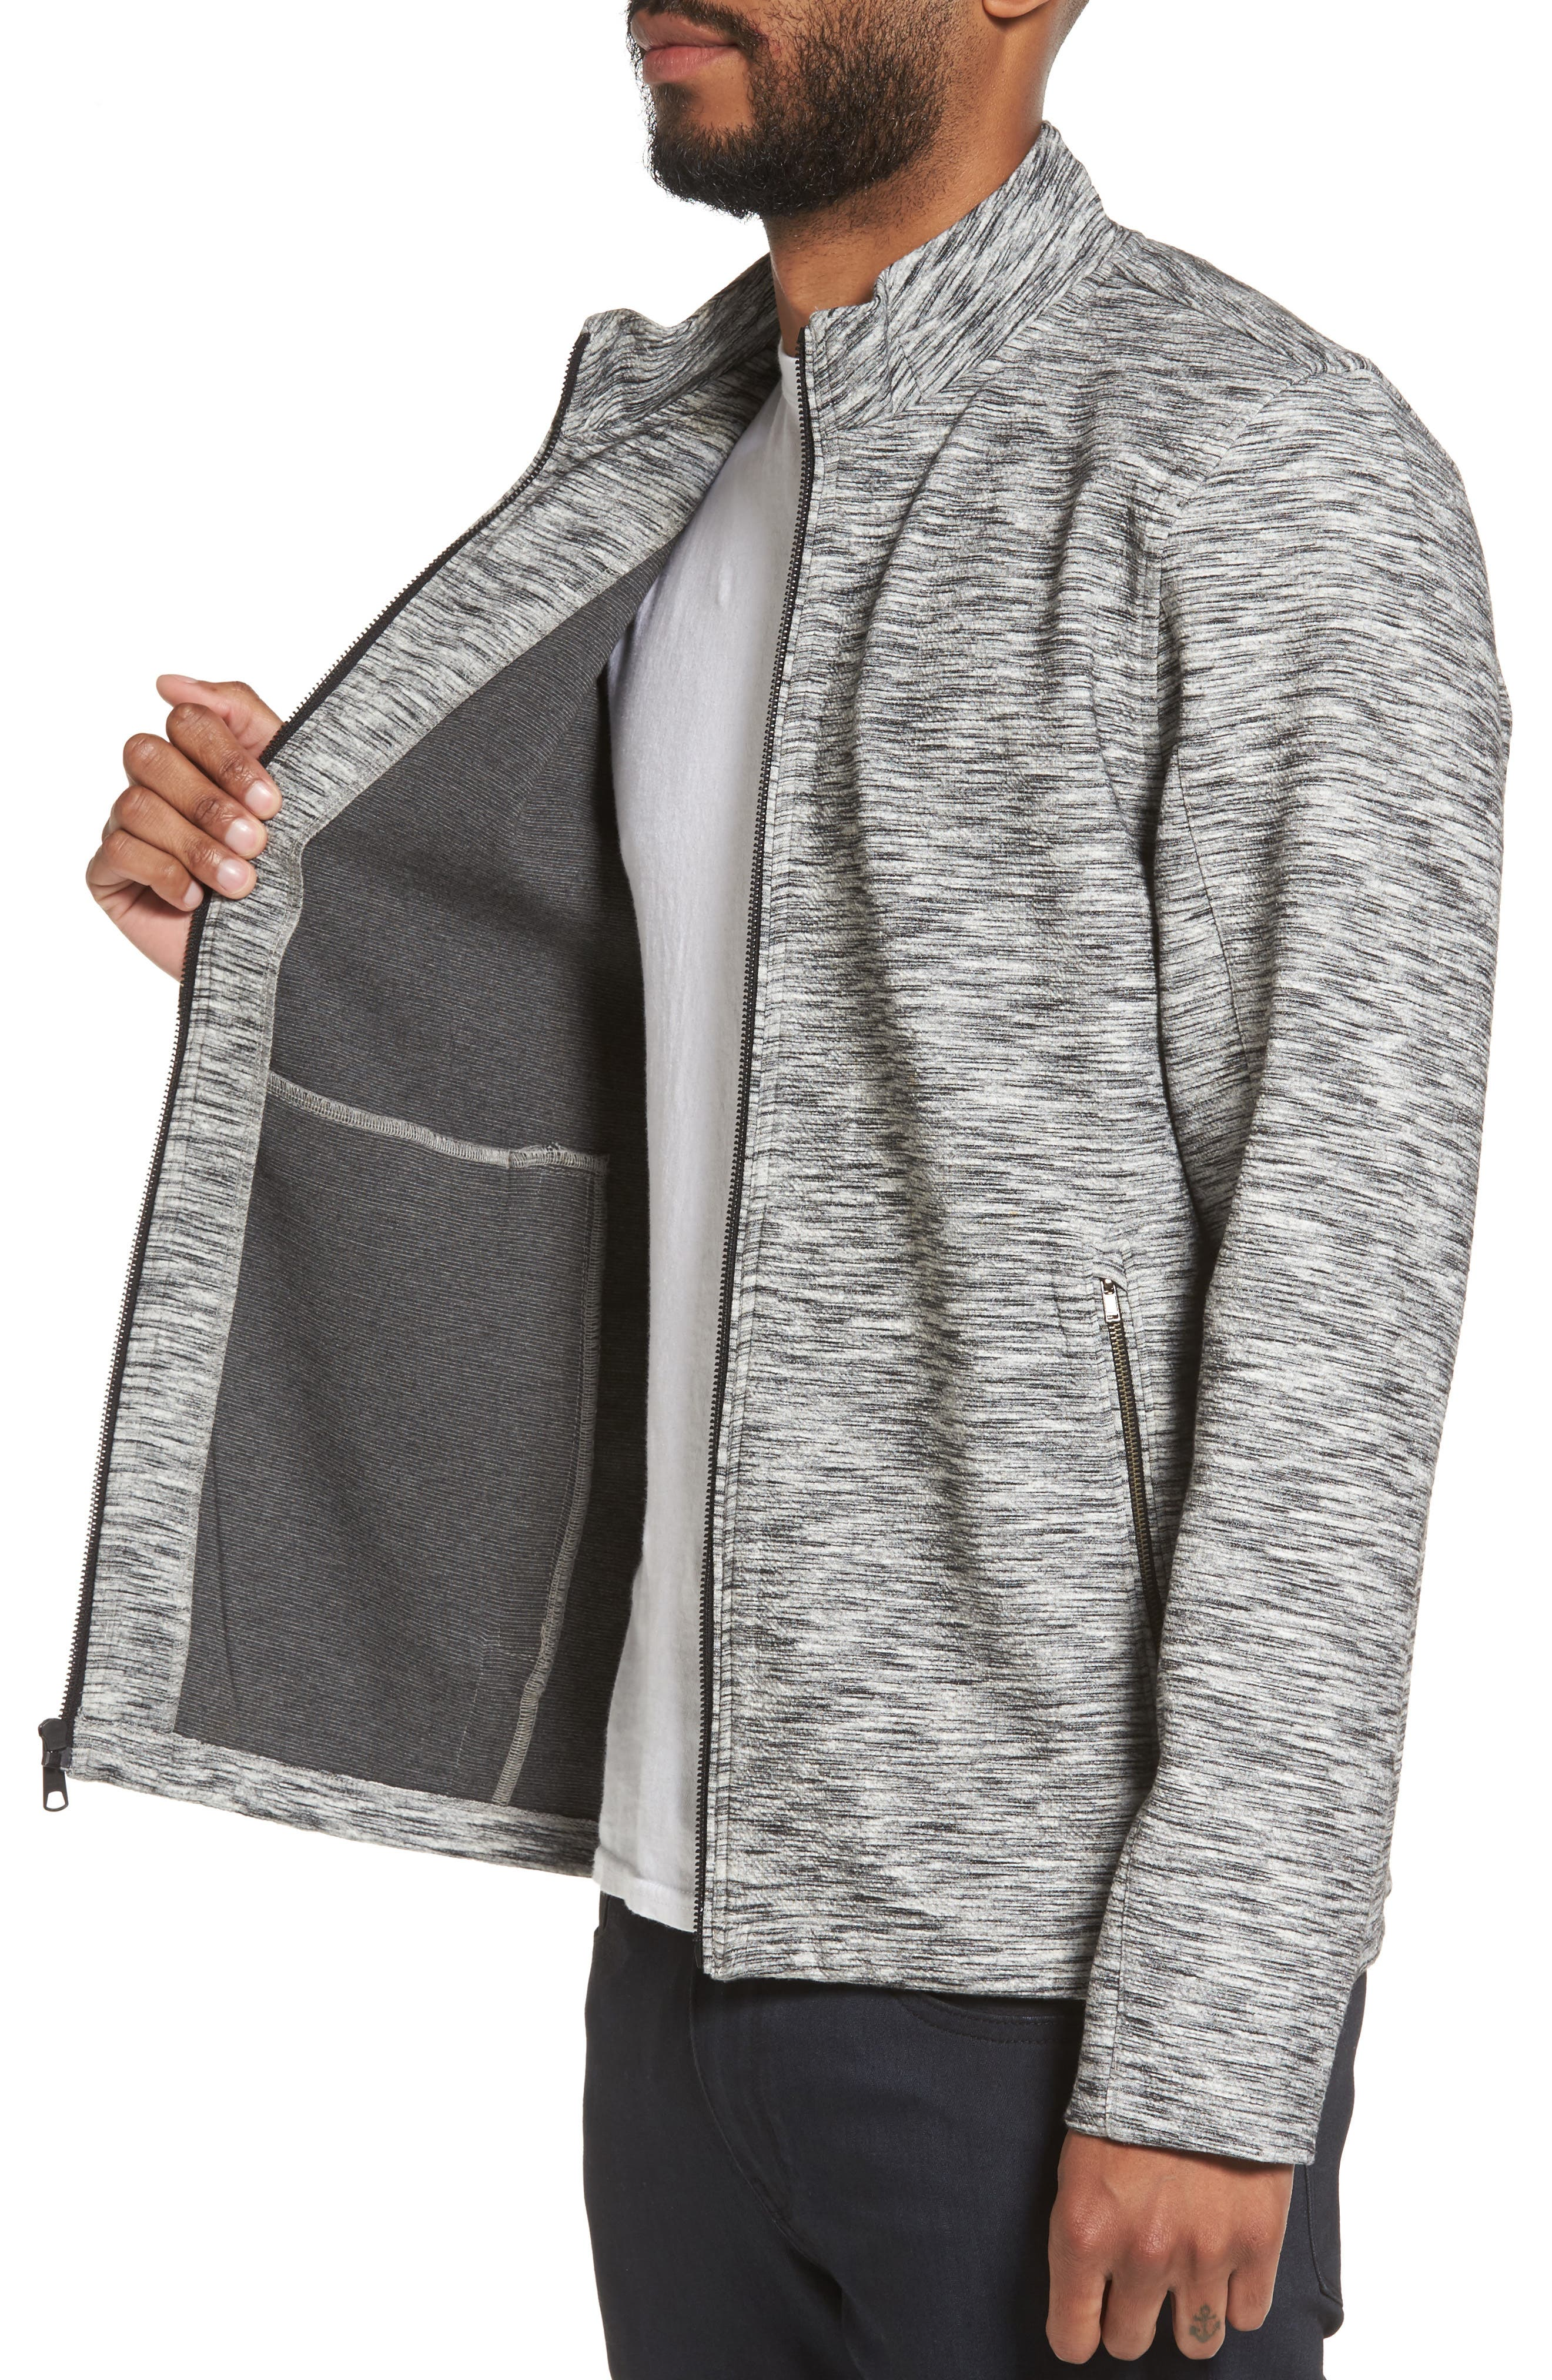 Knit Bomber Jacket,                             Alternate thumbnail 4, color,                             Grey Lunar Spacedye